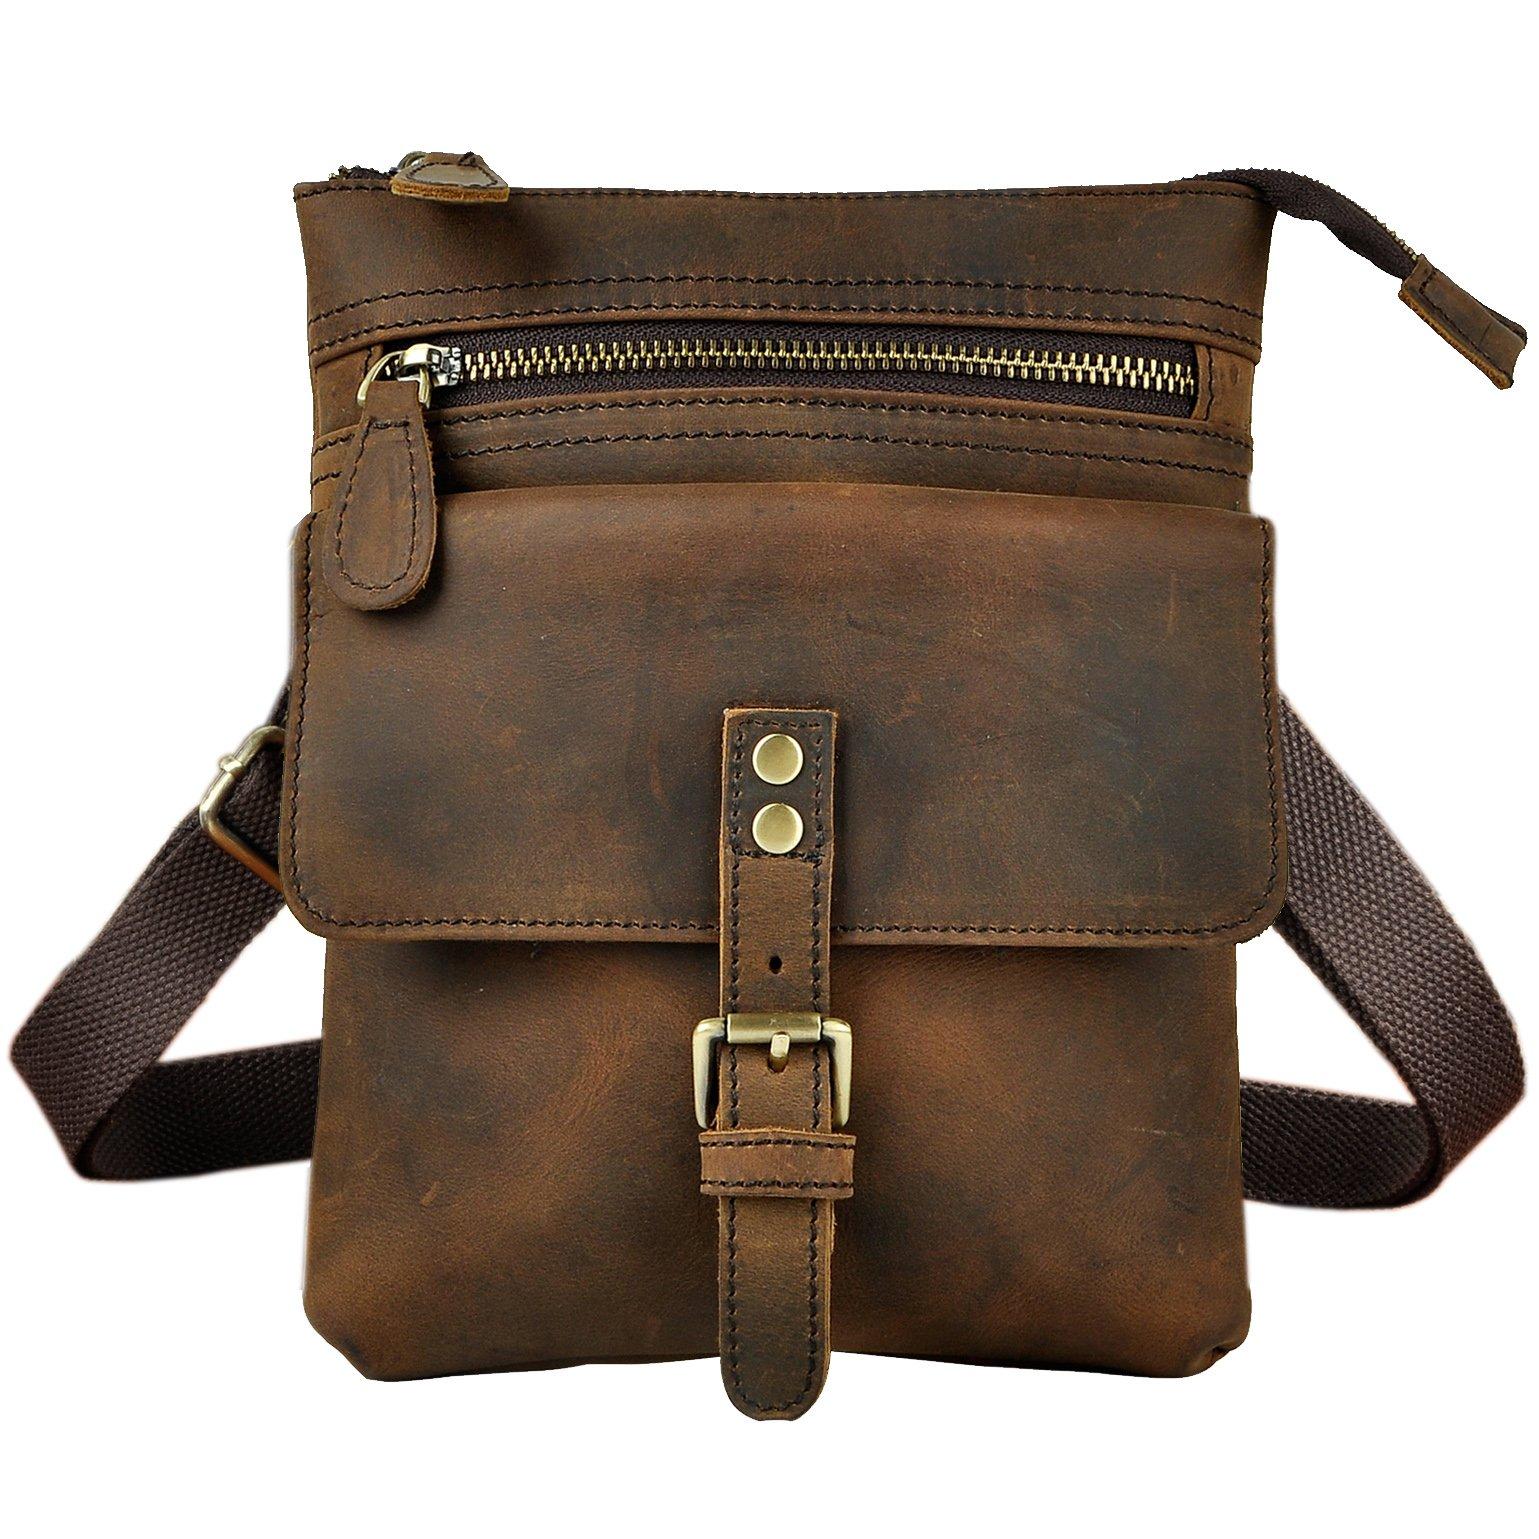 Le'aokuu Mens Genuine Leather Coffee Fanny Small Messenger Shoulder Satchel Waist Bag Pack (The 6574 Dark Brown)